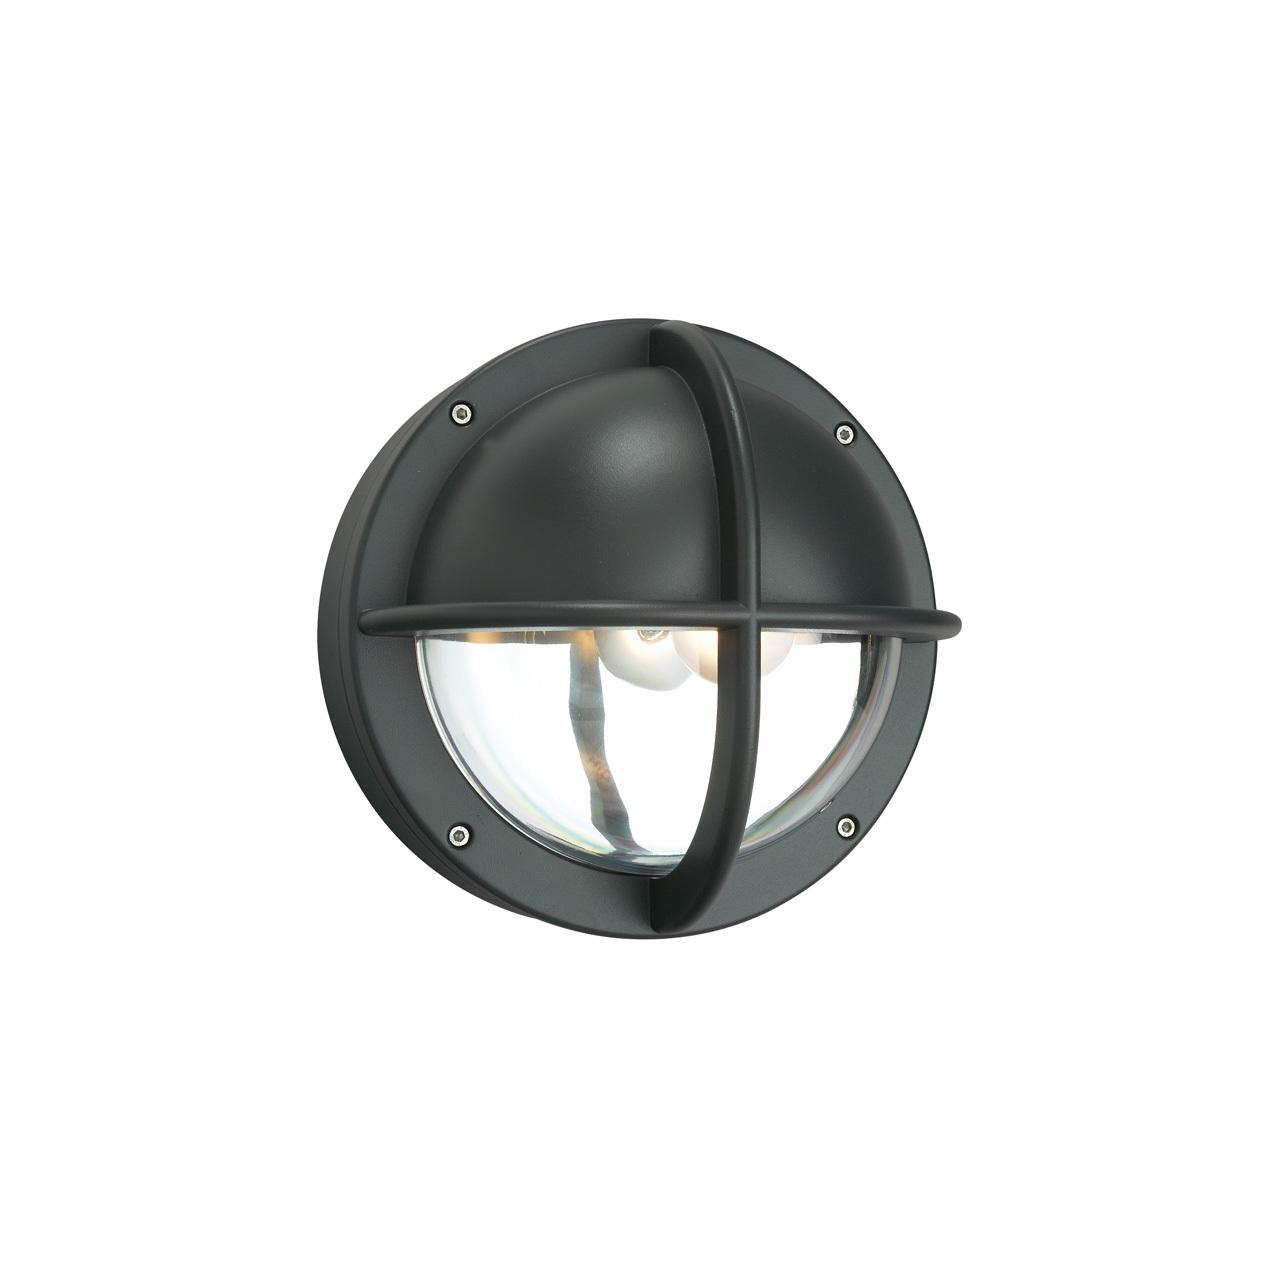 Lampa ścienna KIRUNA 597GR -Norlys